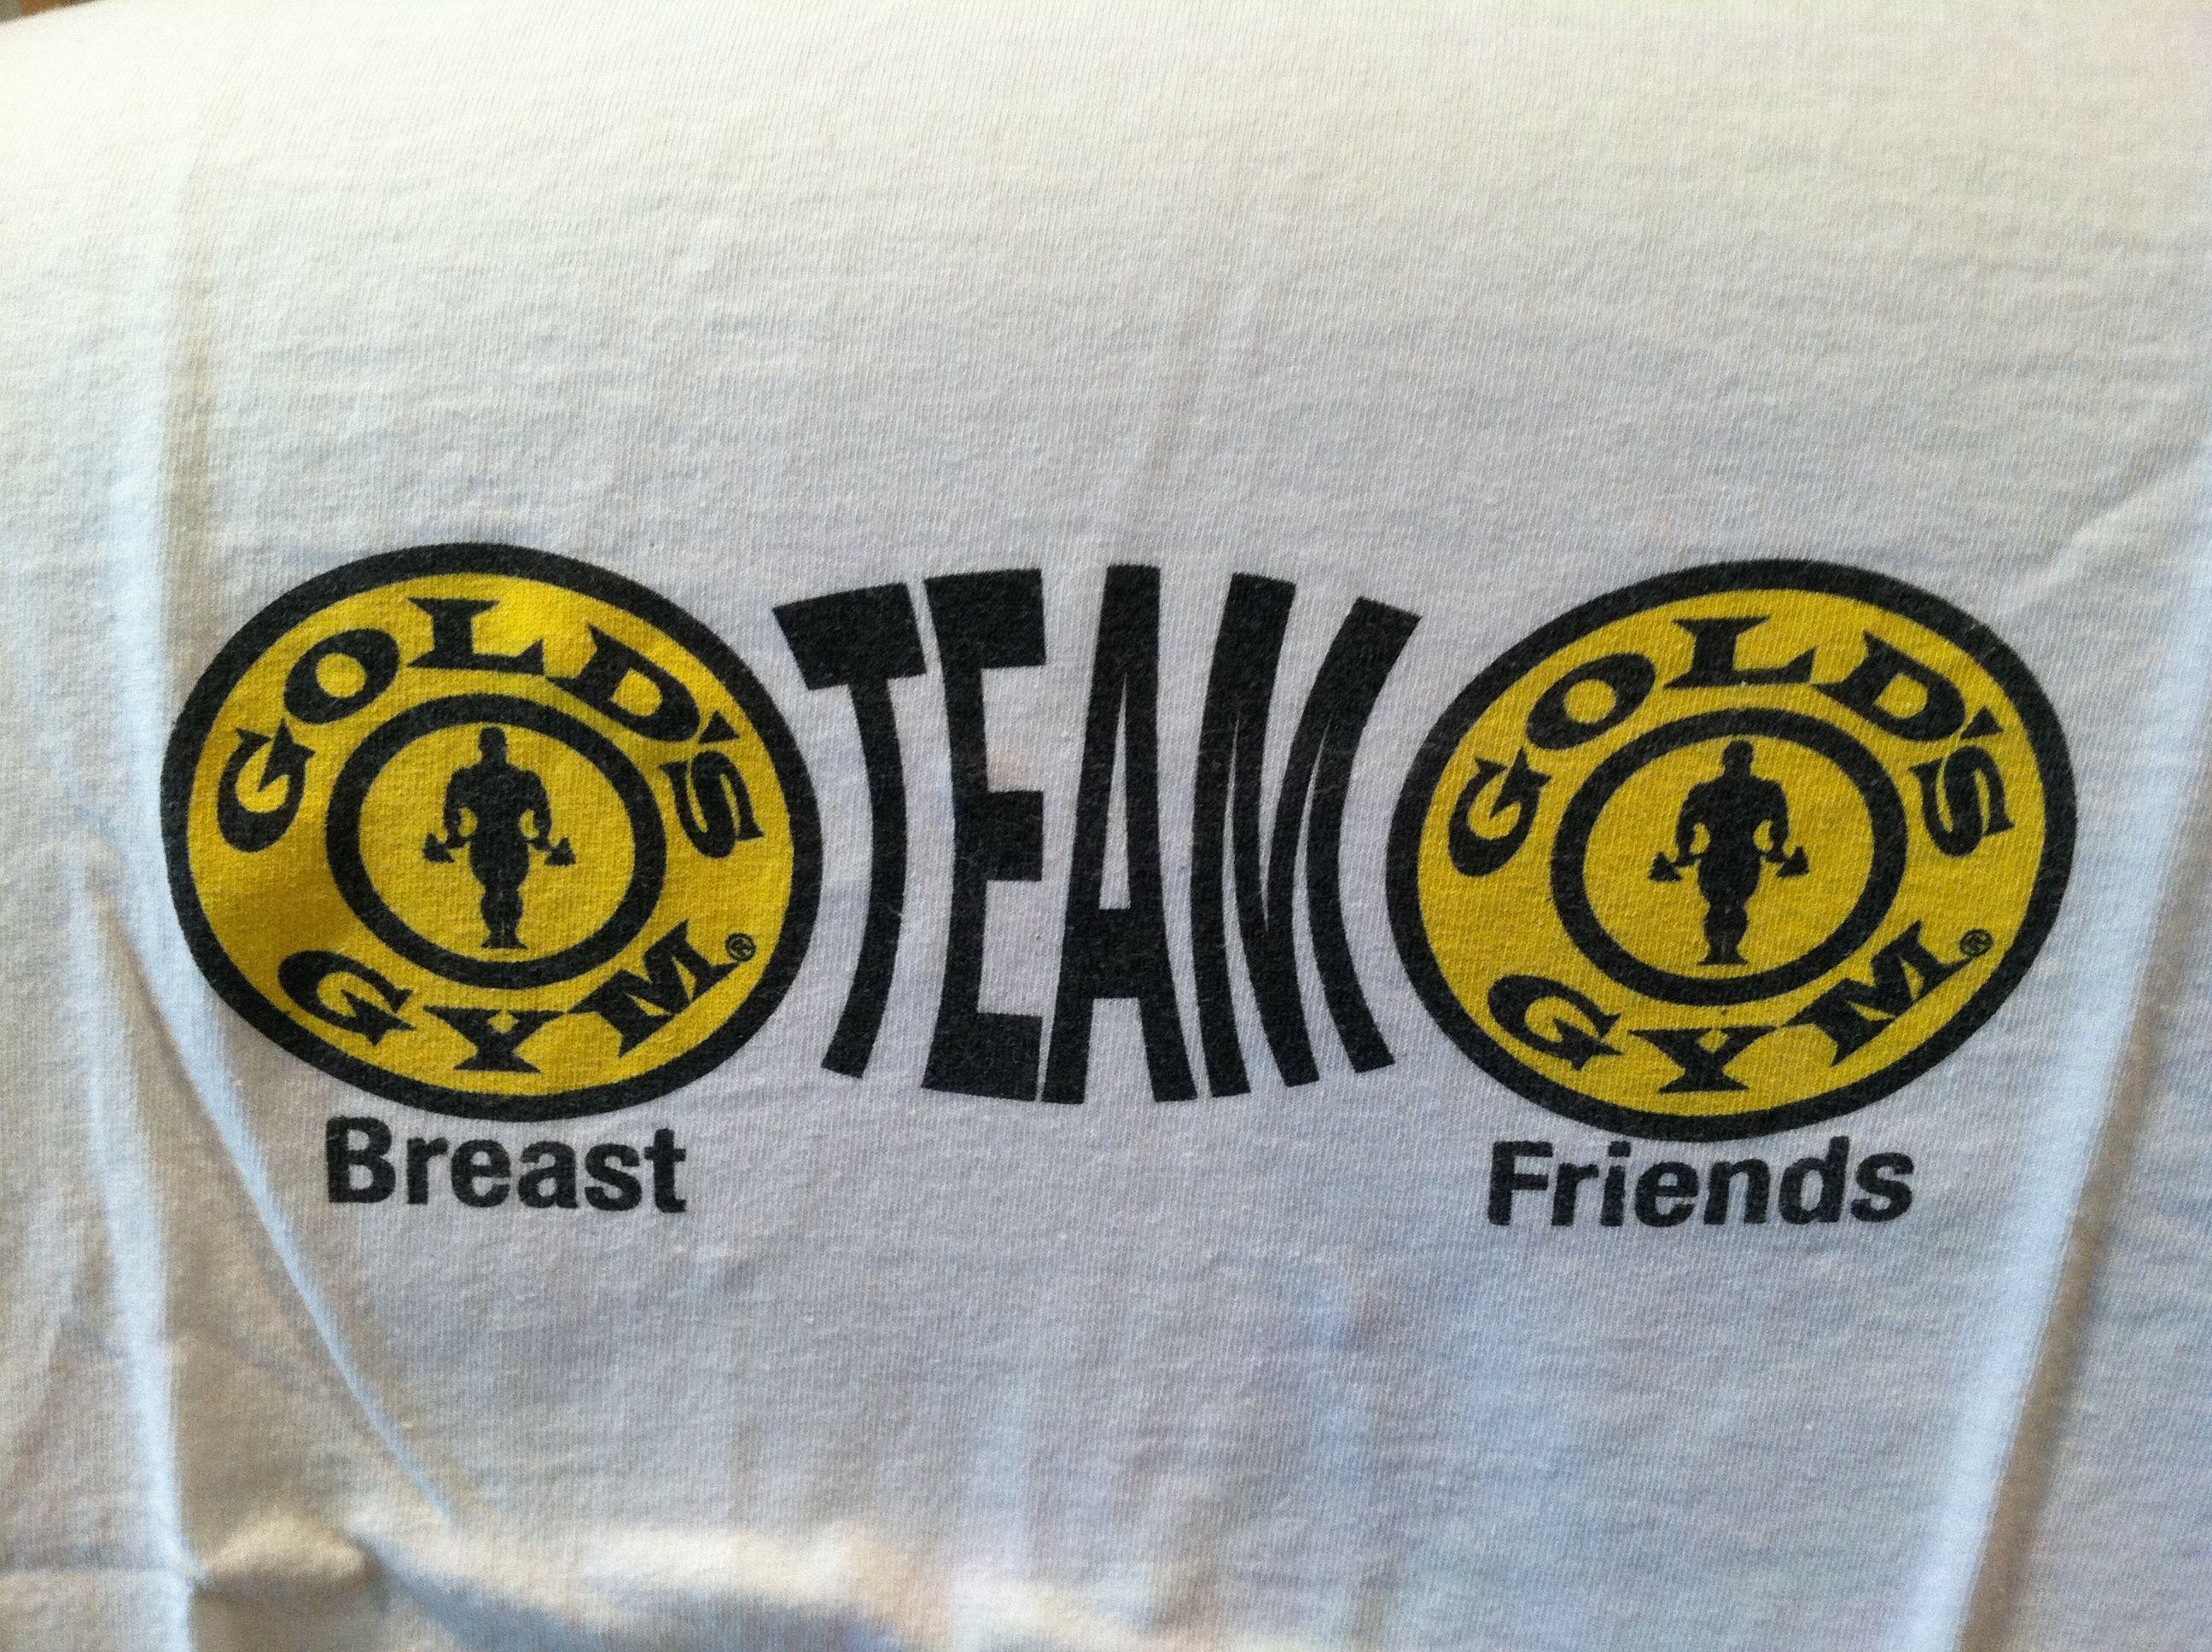 Gold's Gym Paramus Team Breast Friends Walk for Breast Cancer